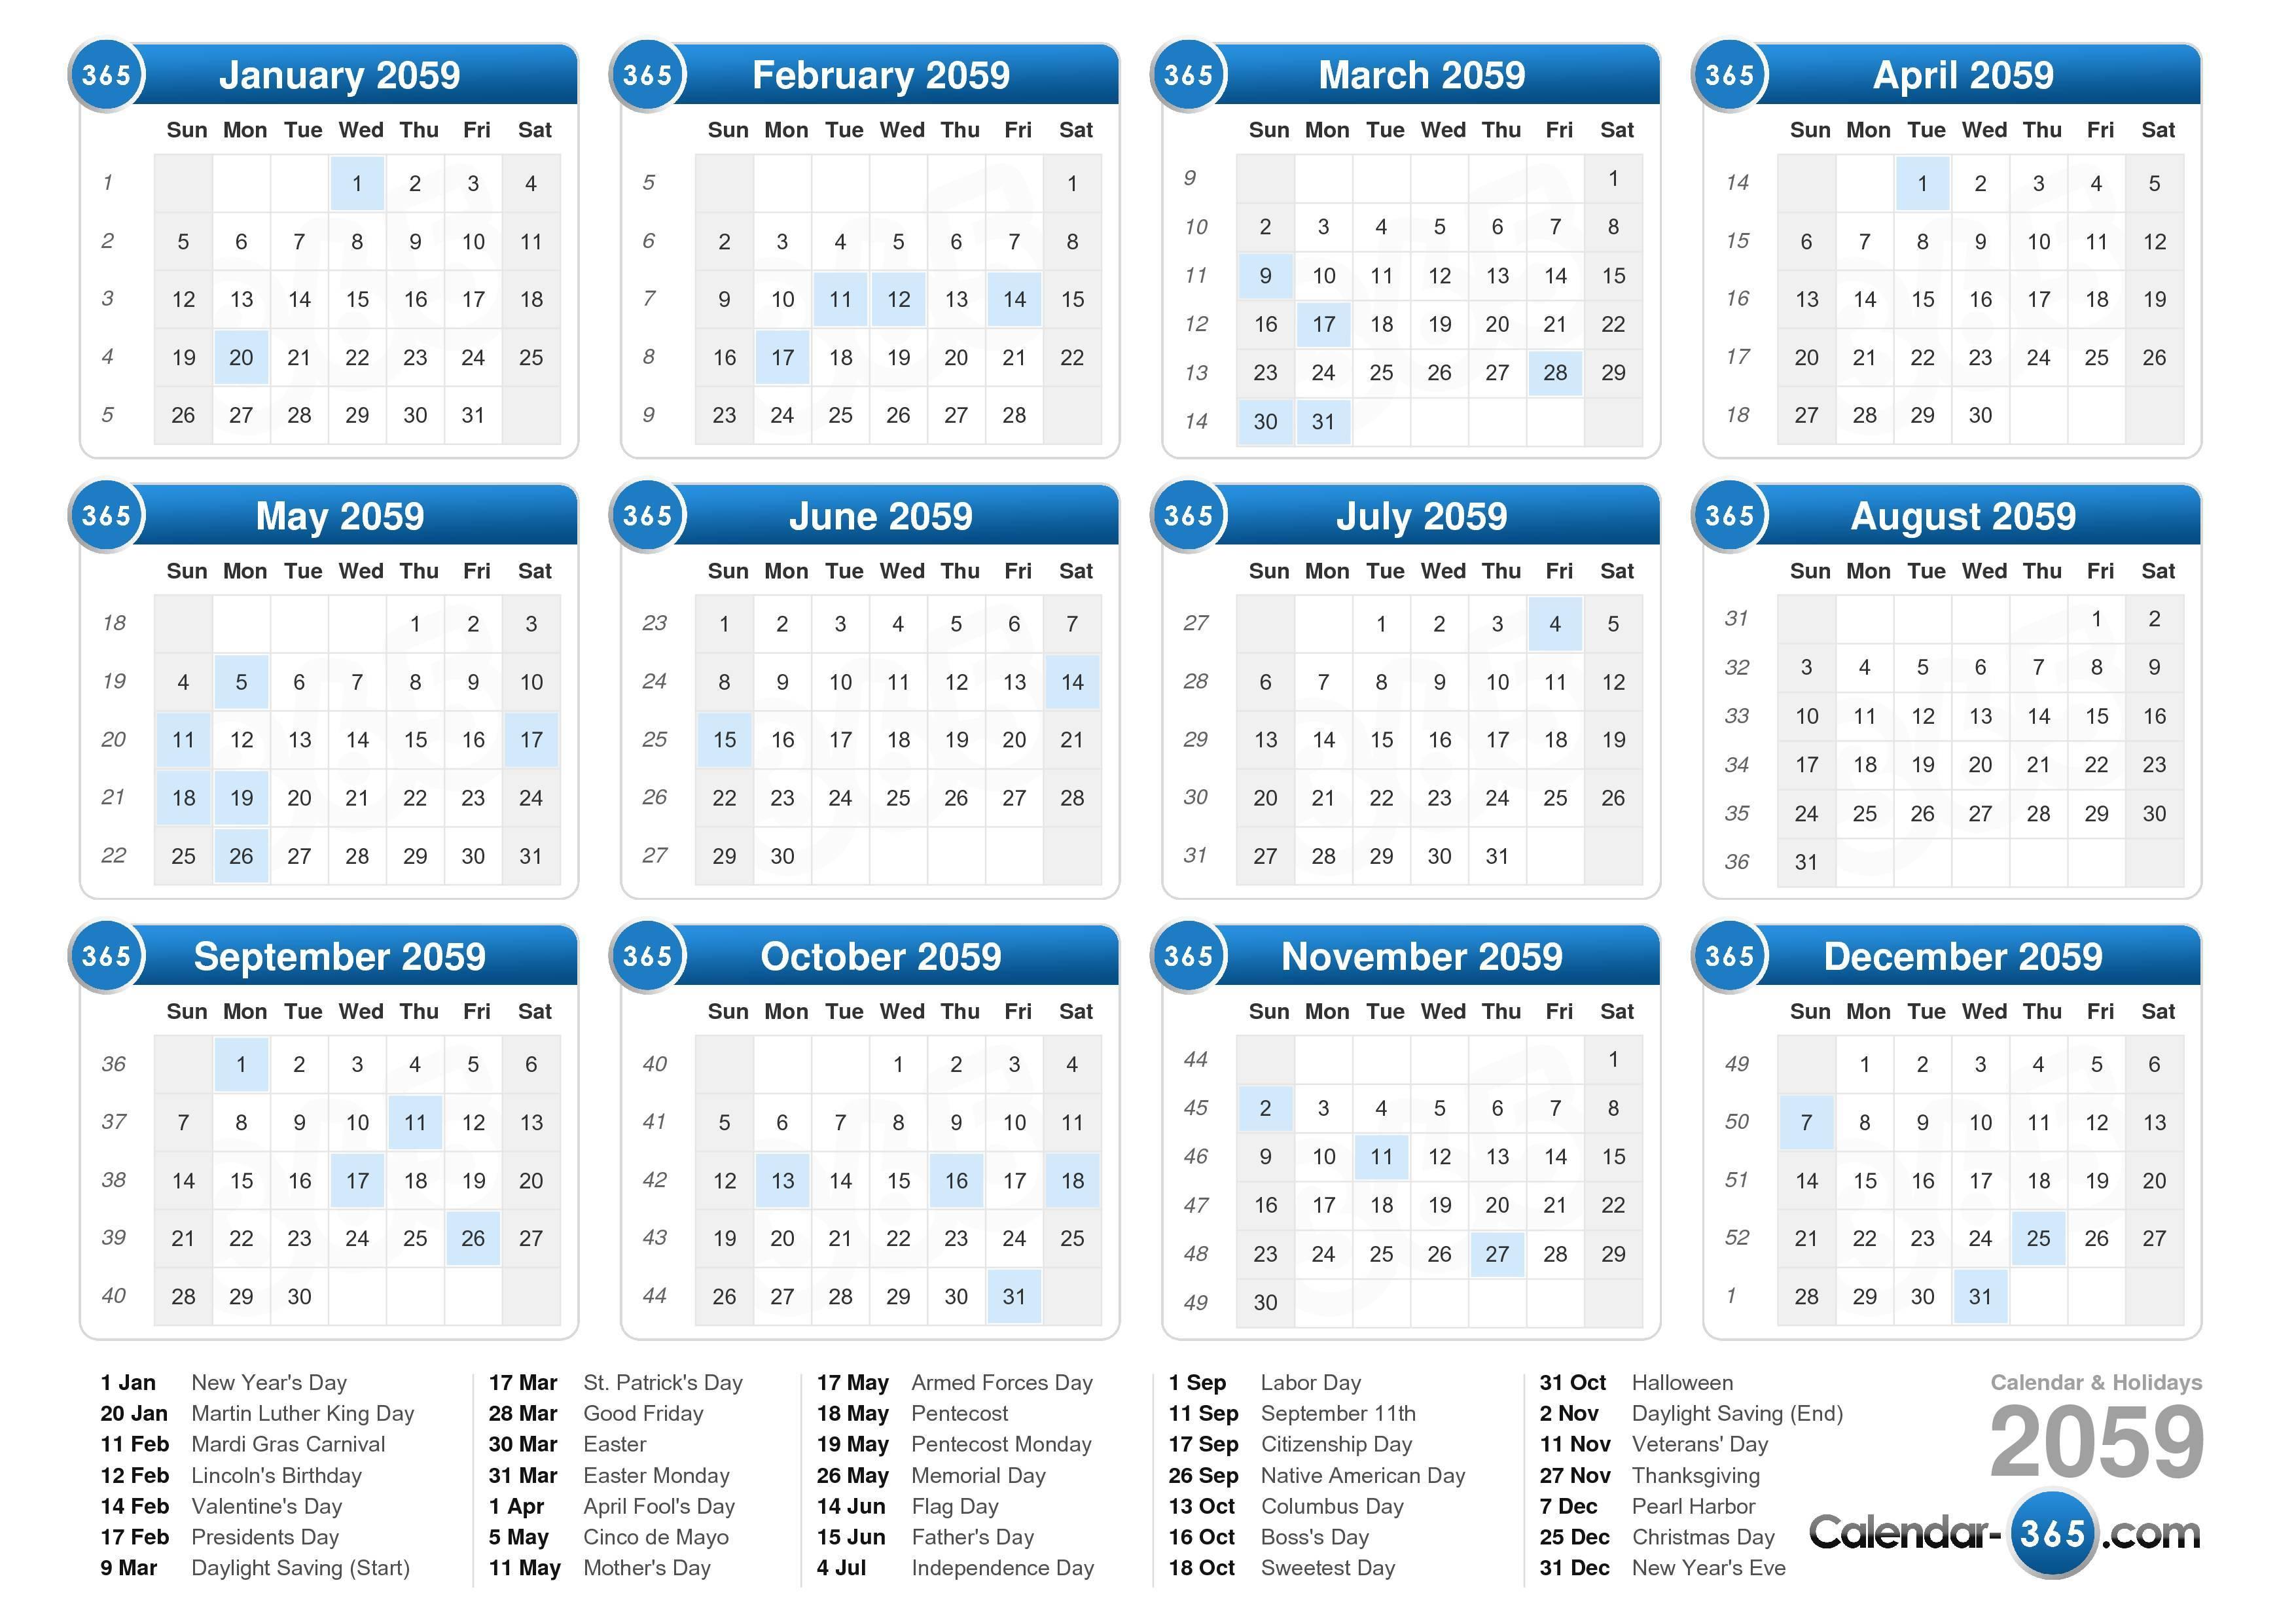 ... calendar with holidays landscape format 1 page 2059 calendar 155 486